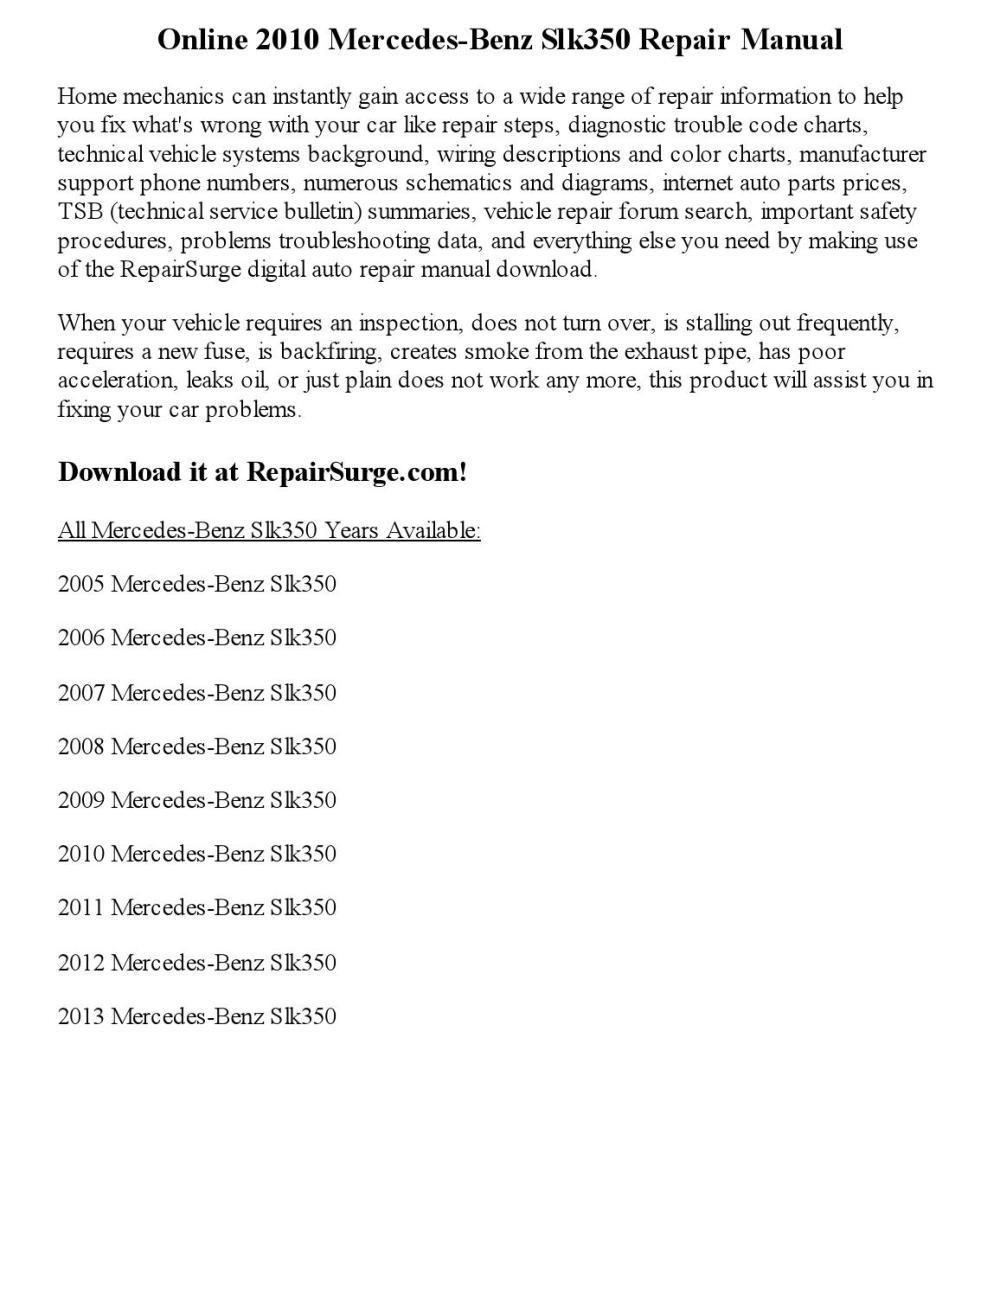 medium resolution of 2010 mercedes benz slk350 repair manual online